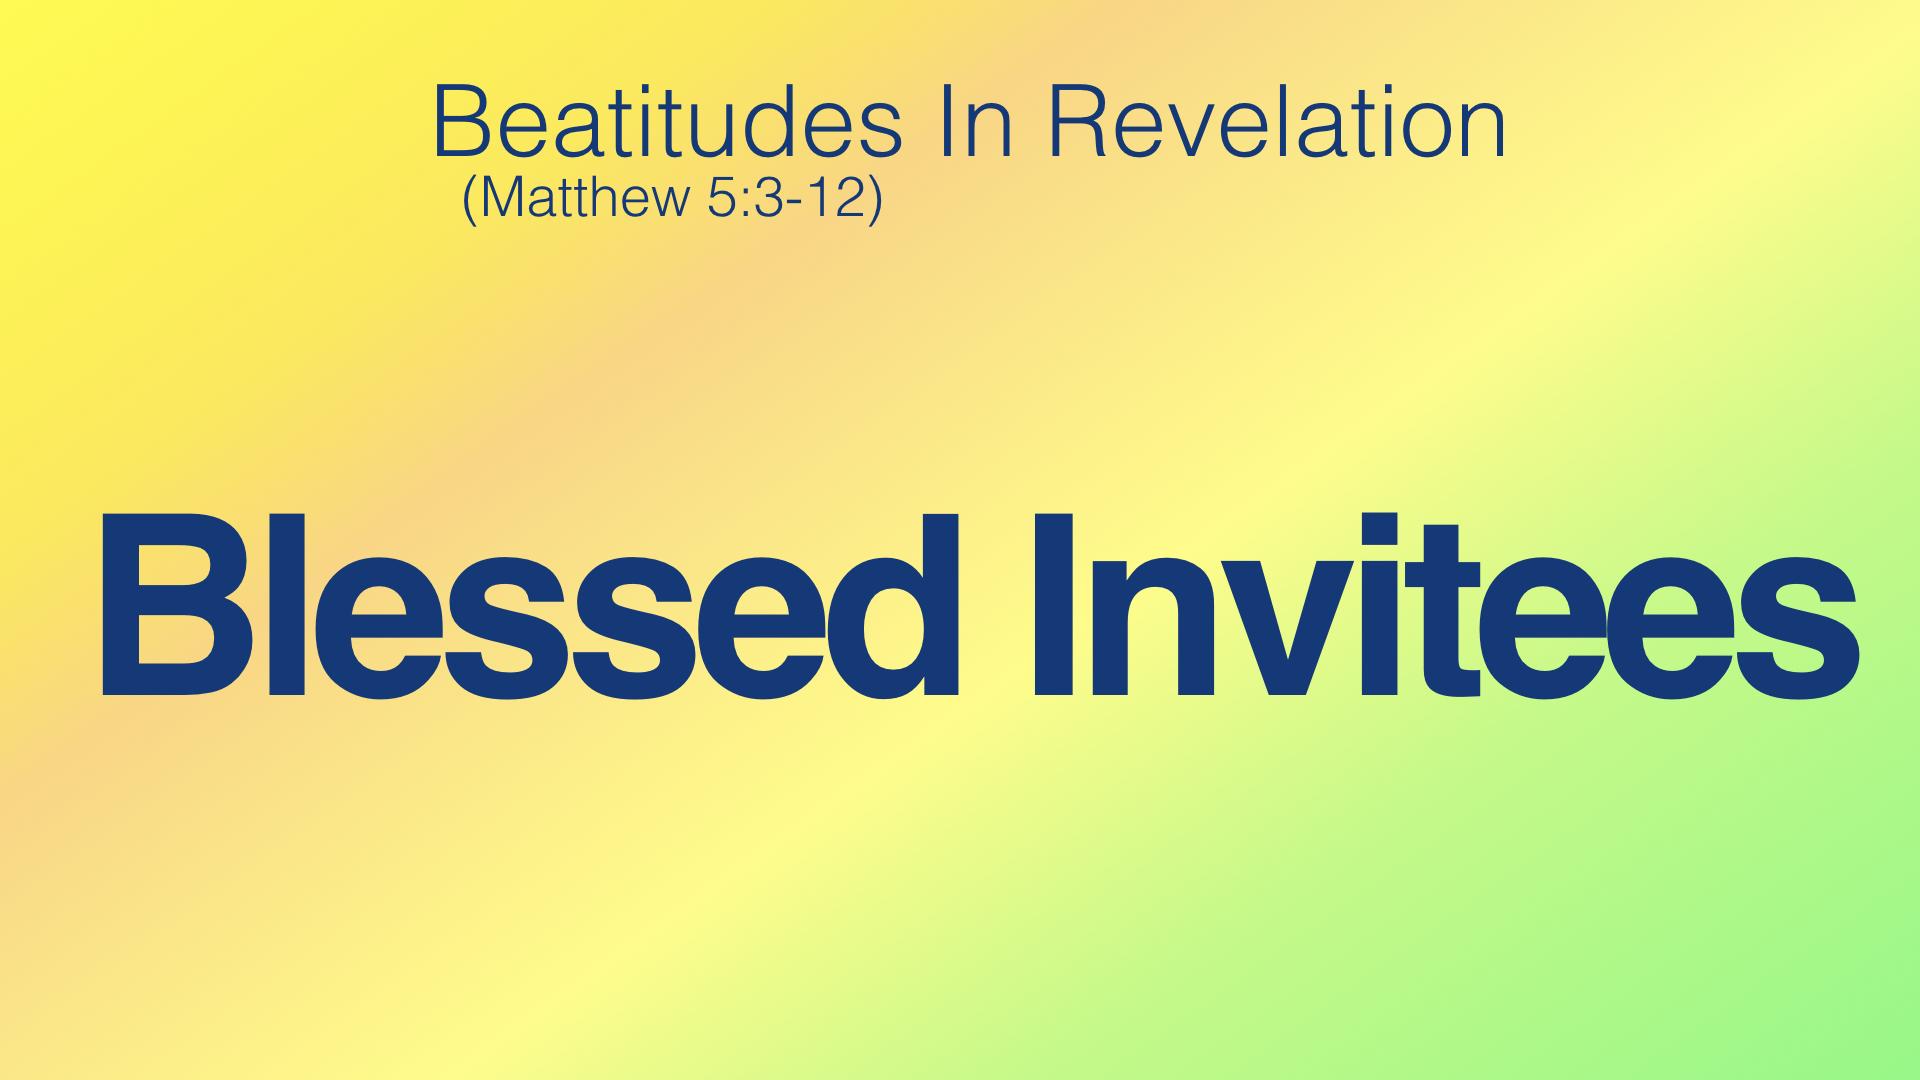 Blessed Invitees - Beatitudes in Revelation (4).jpeg